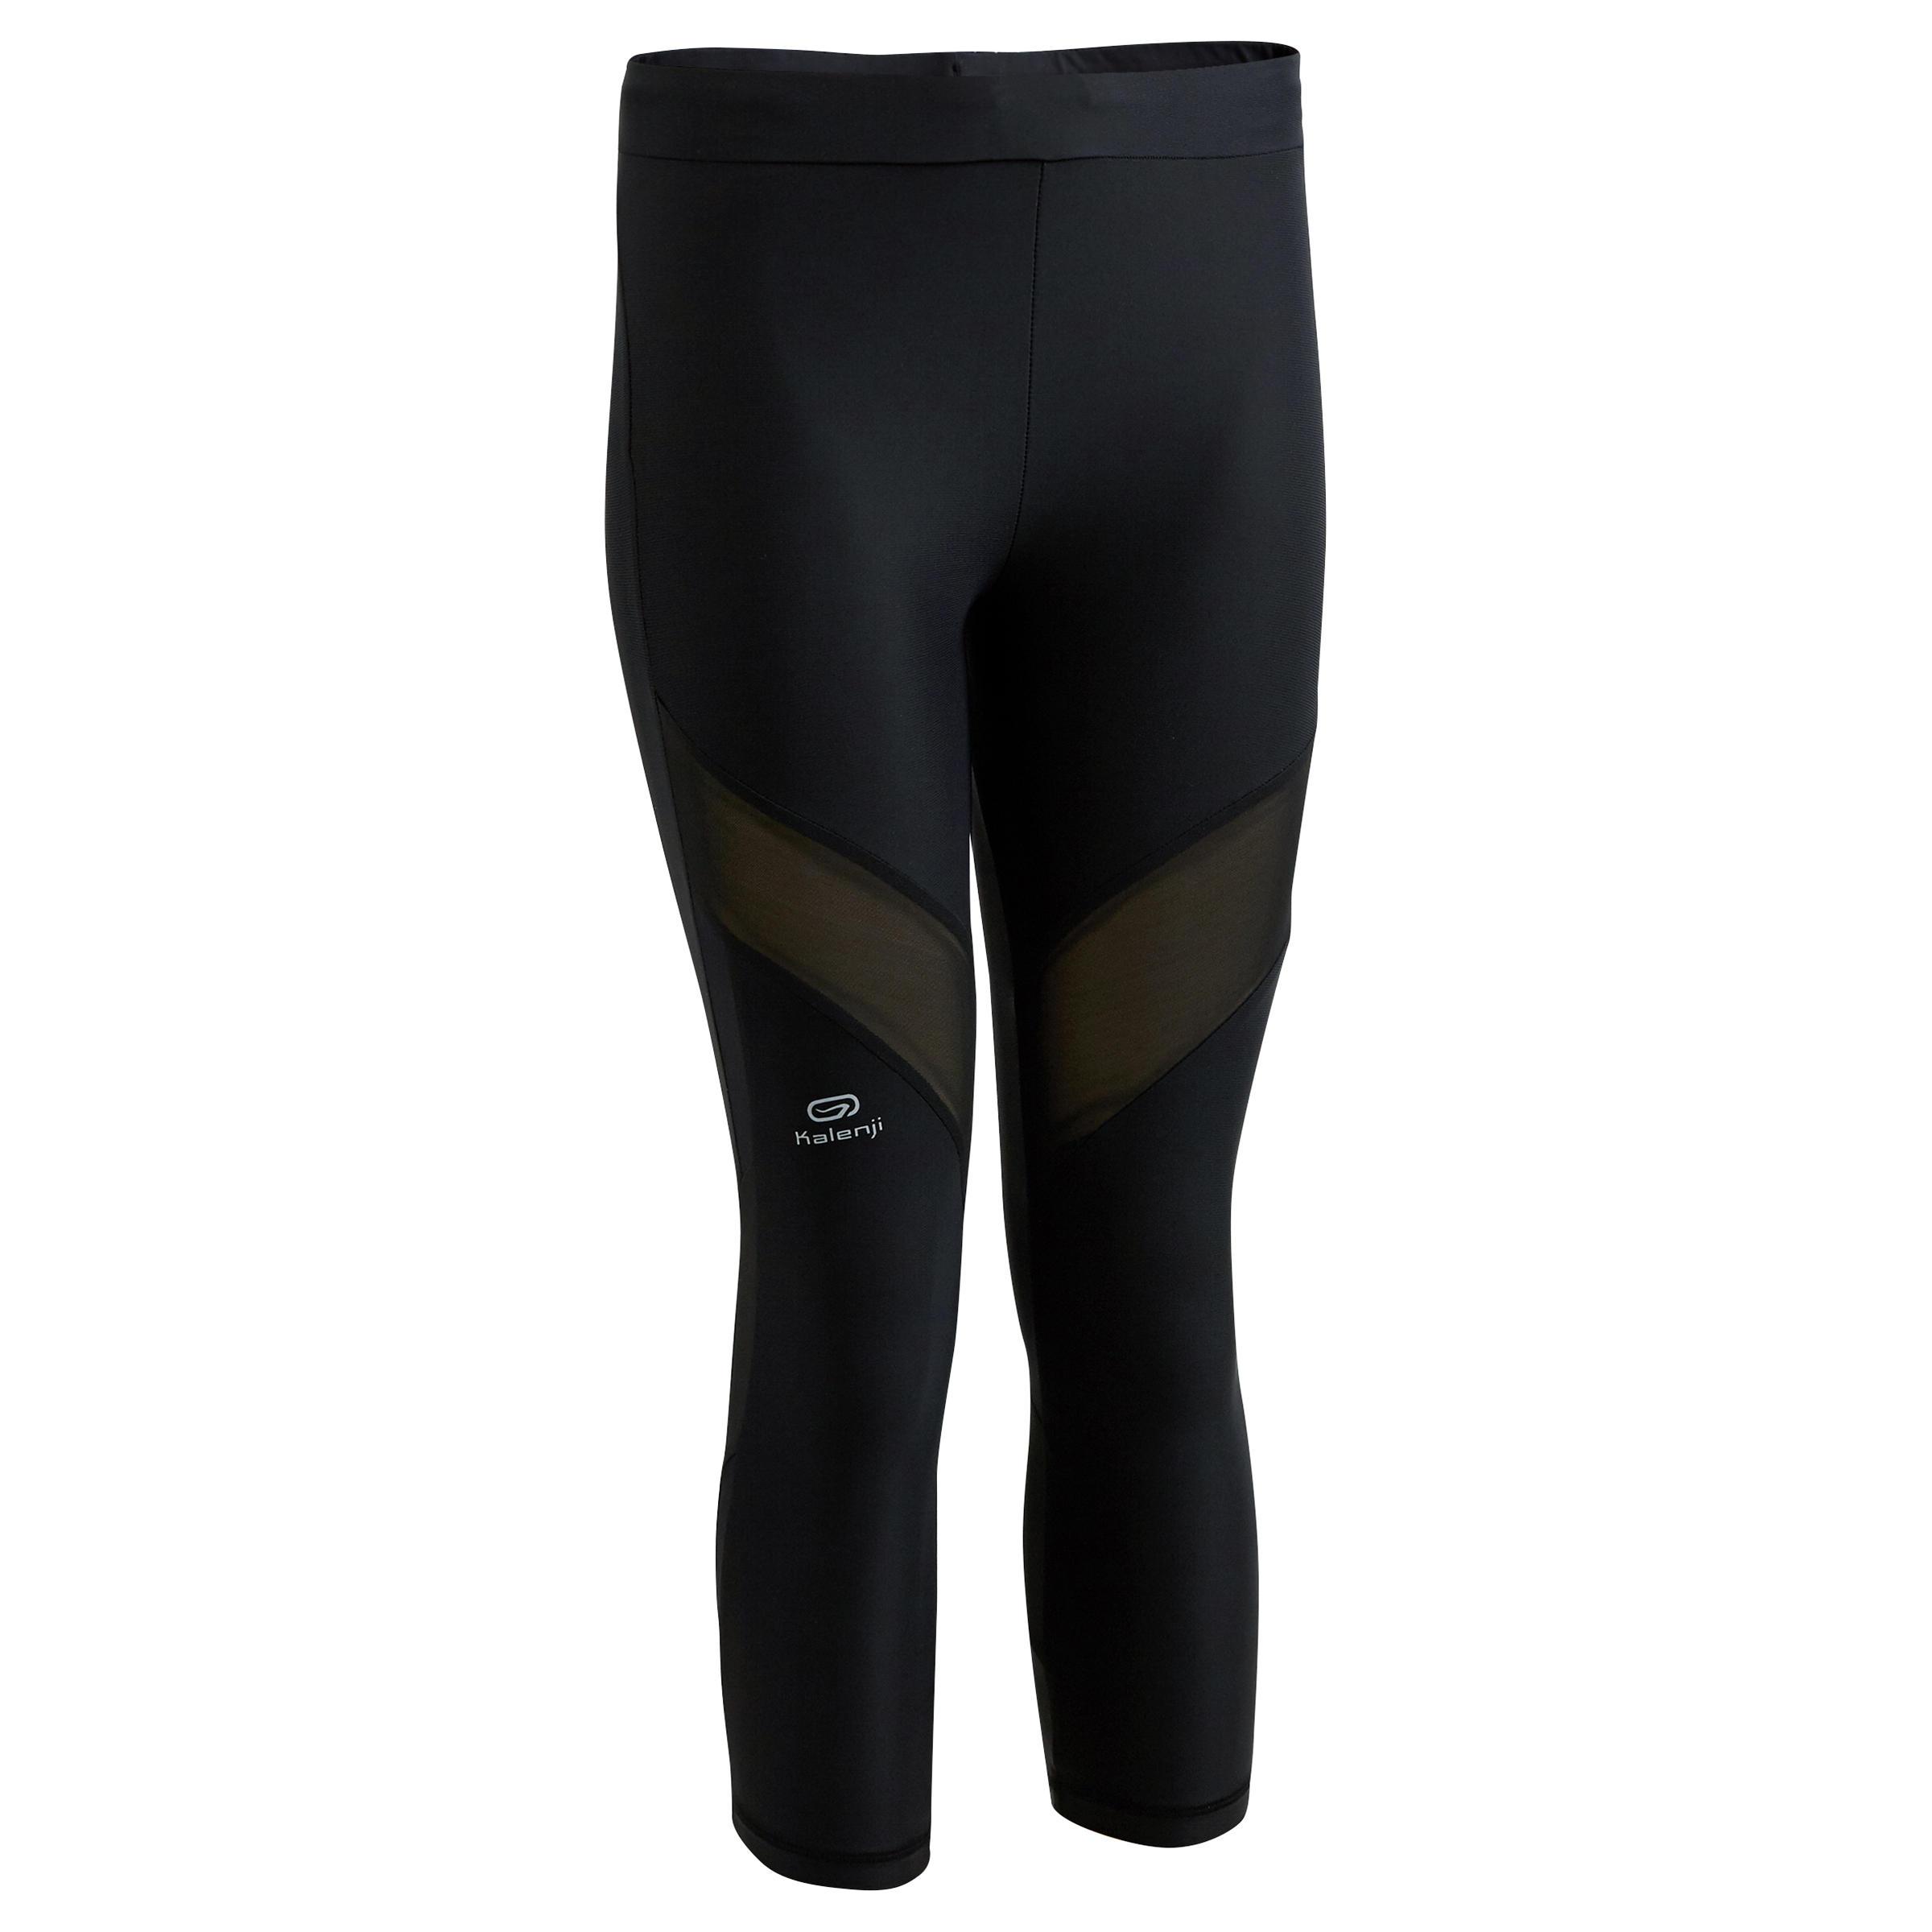 Kalenji Kiprun Support Women's Running Cropped Bottoms - Black